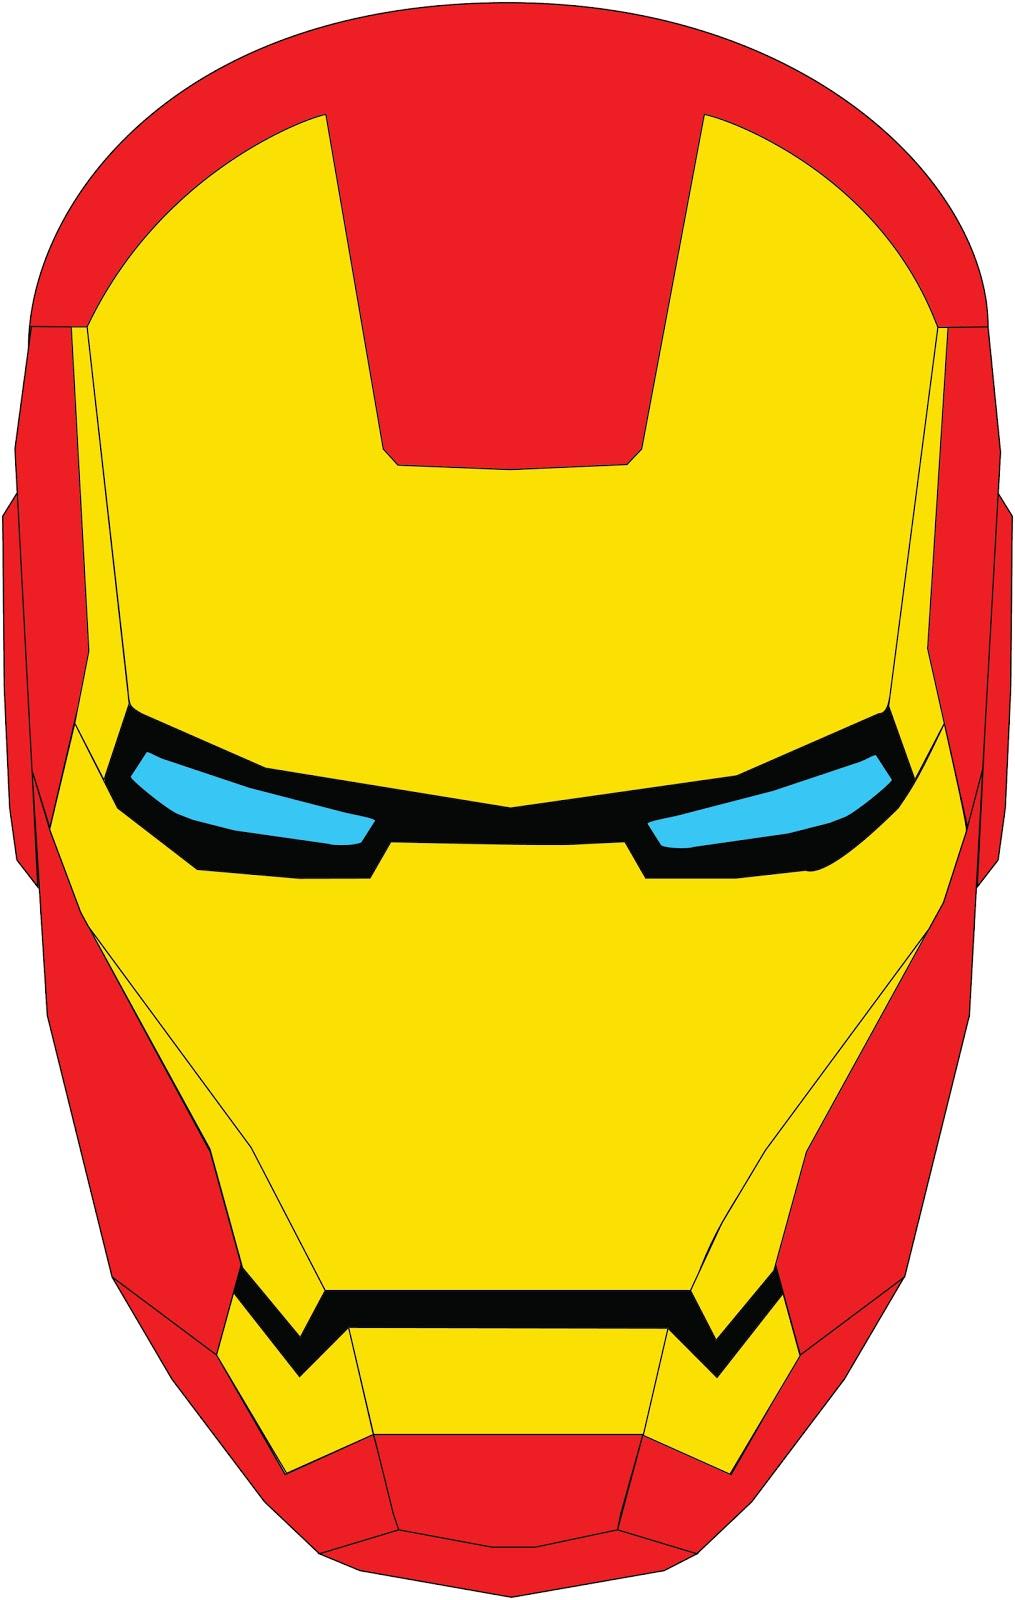 Iron Man Vector Logo x3cbx3eiron Manx3cbx3e Marvel x3cbx3elogo